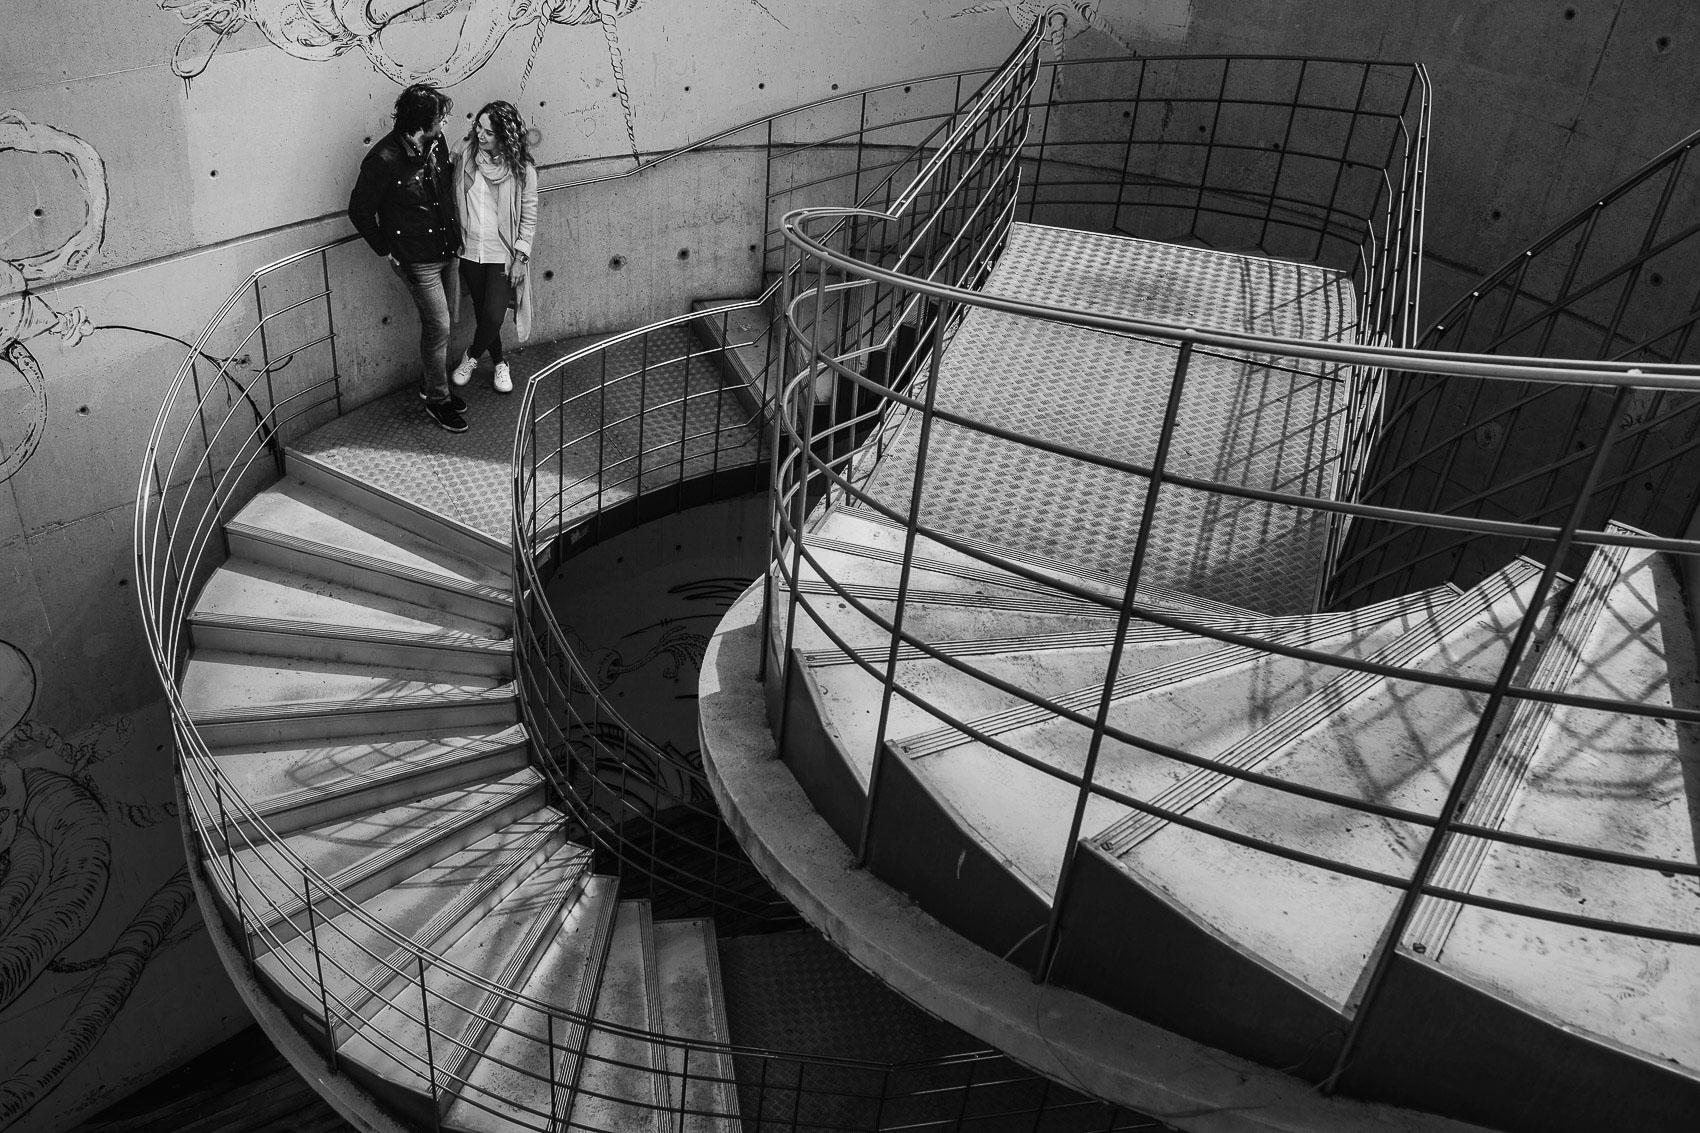 fotografia pareja escaleras arquitectura sombras